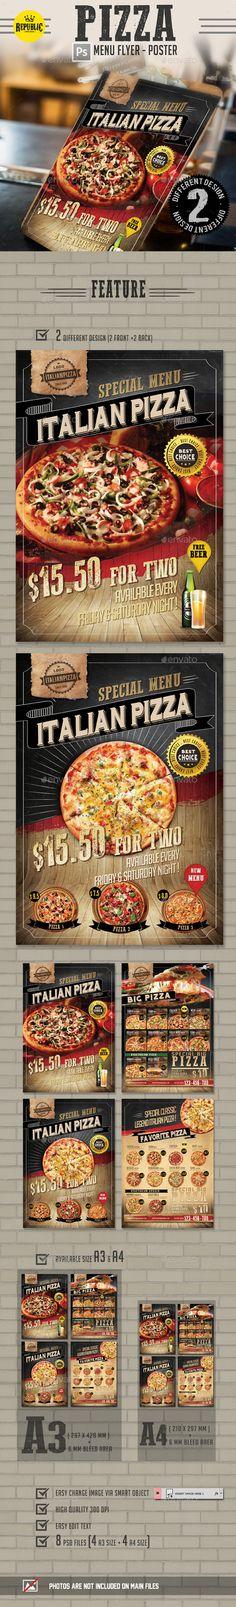 Pizza Menu Flyer Template PSD. Download here: http://graphicriver.net/item/pizza-menu-flyer-/15558970?ref=ksioks